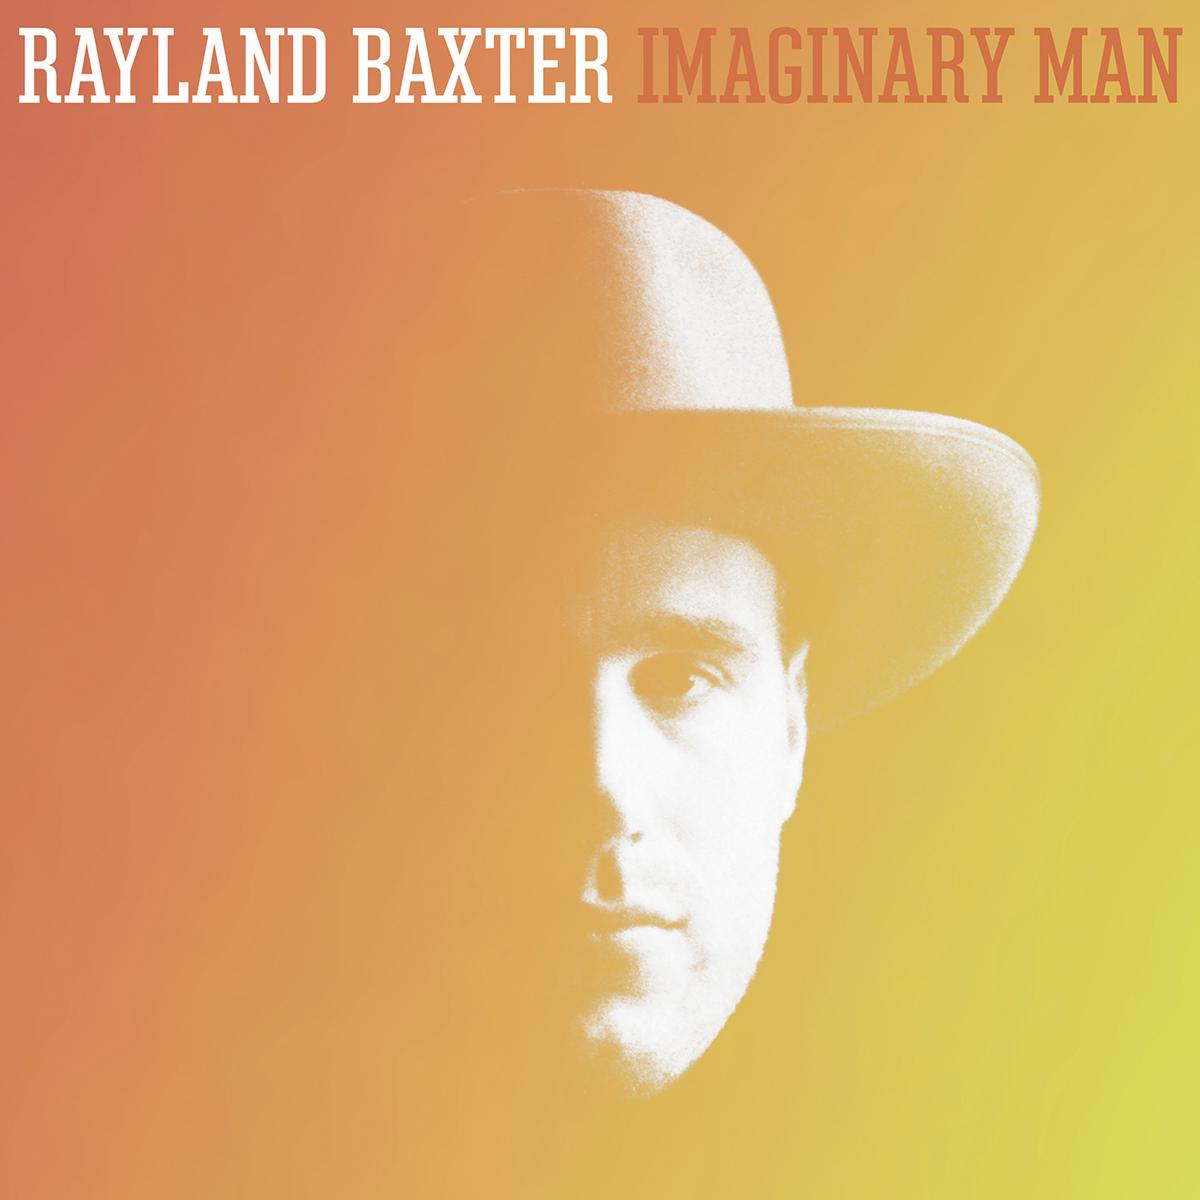 Rayland Baxter - Imaginary Man (MP3 or FLAC - Digital Download)